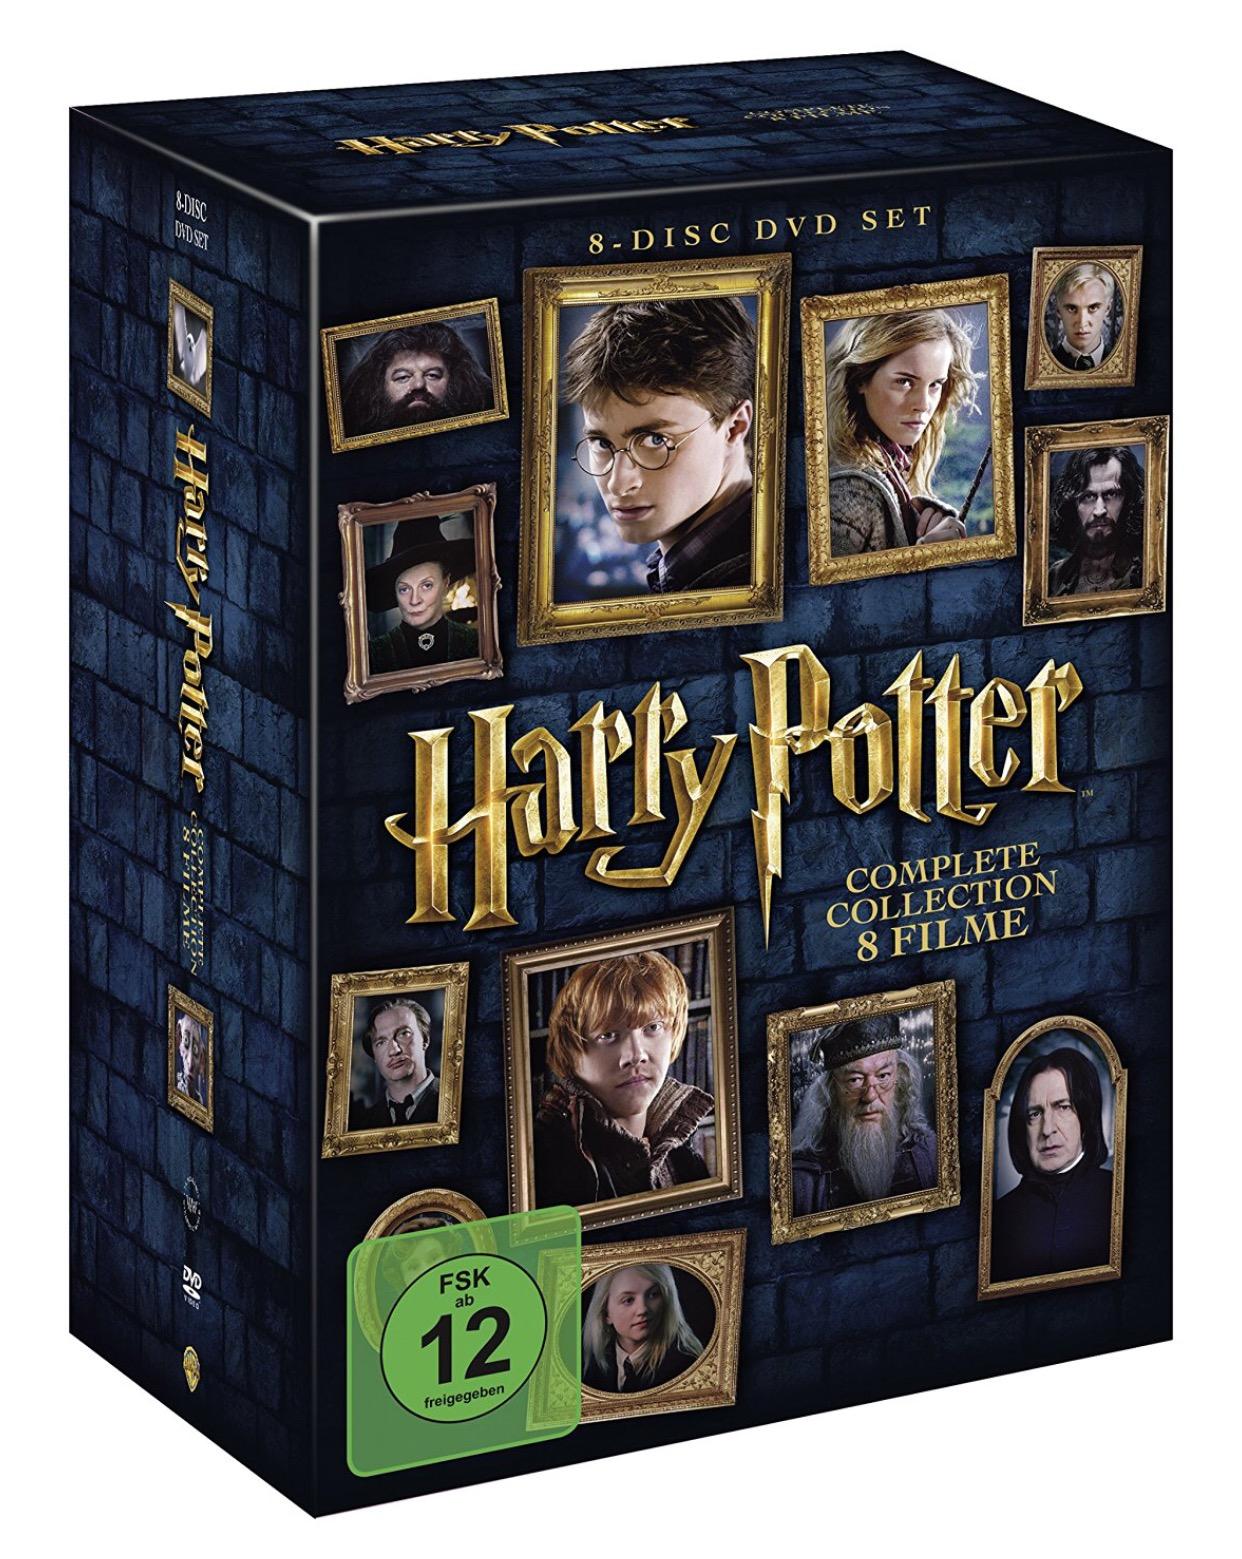 Harry Potter DVD Set für 14,99 [Real]